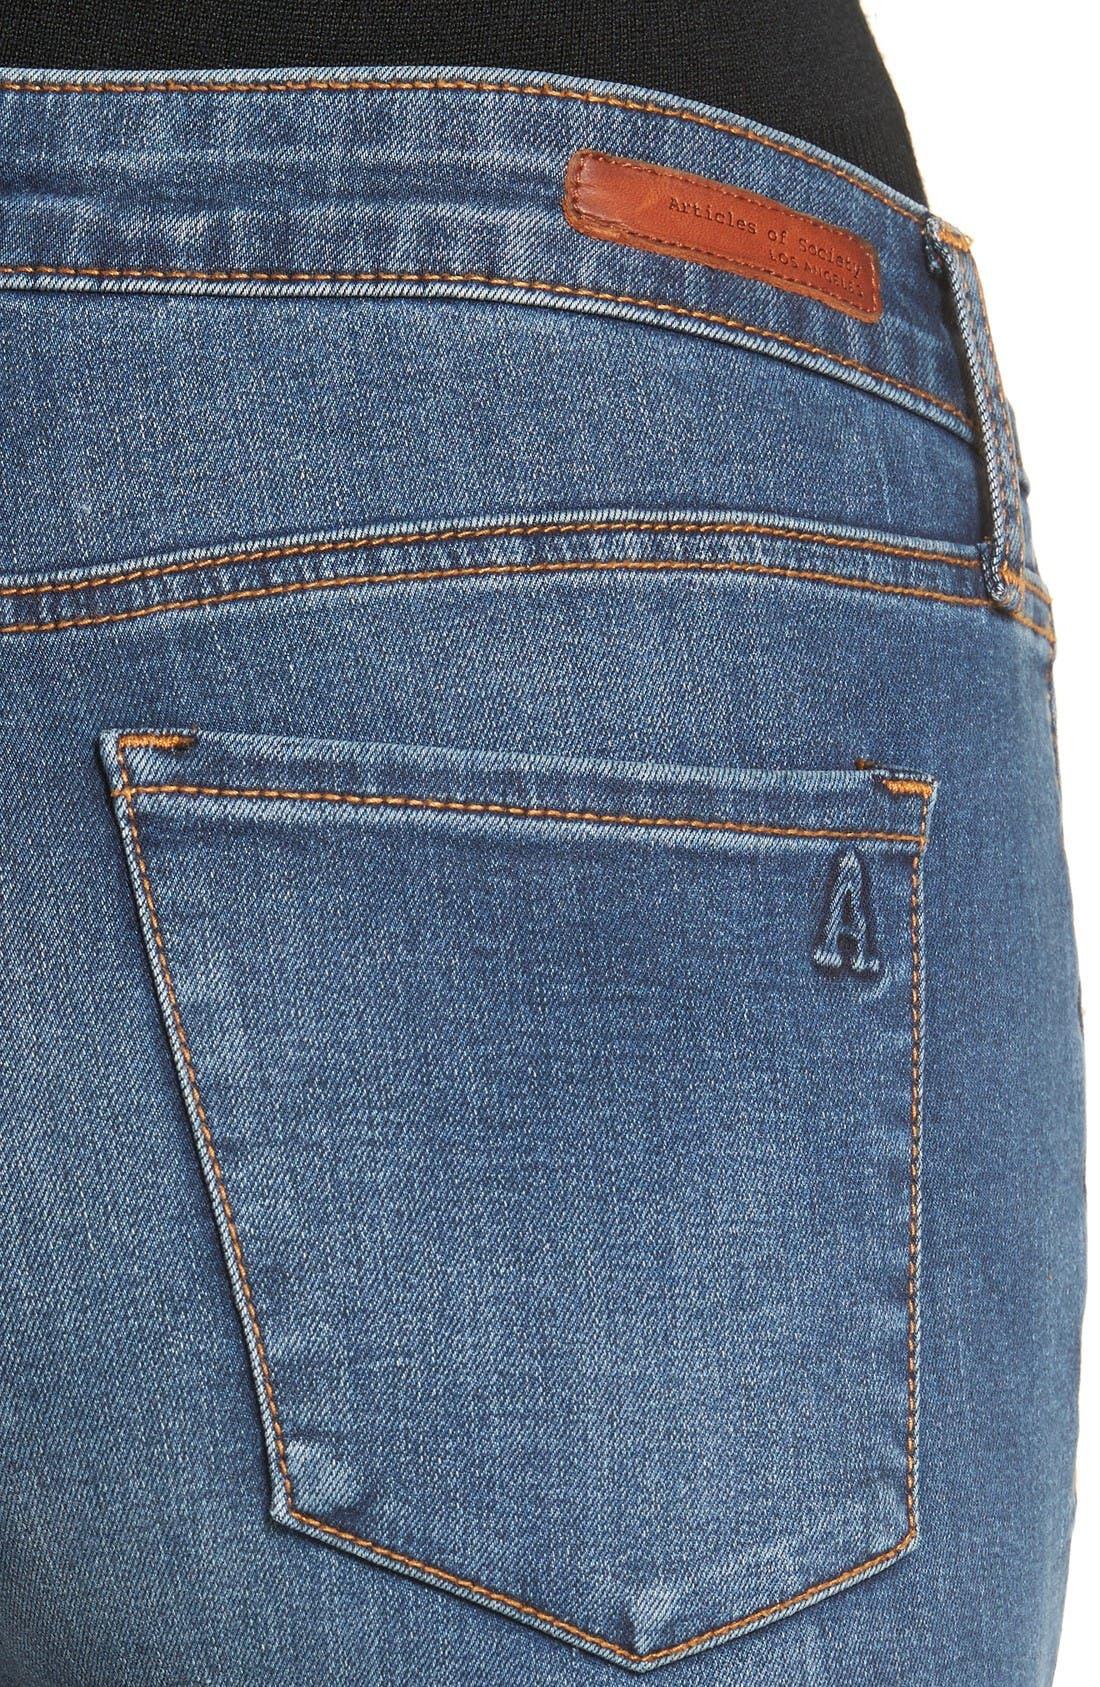 Alternate Image 5  - Articles of Society Sarah Skinny Jeans (Bancroft)